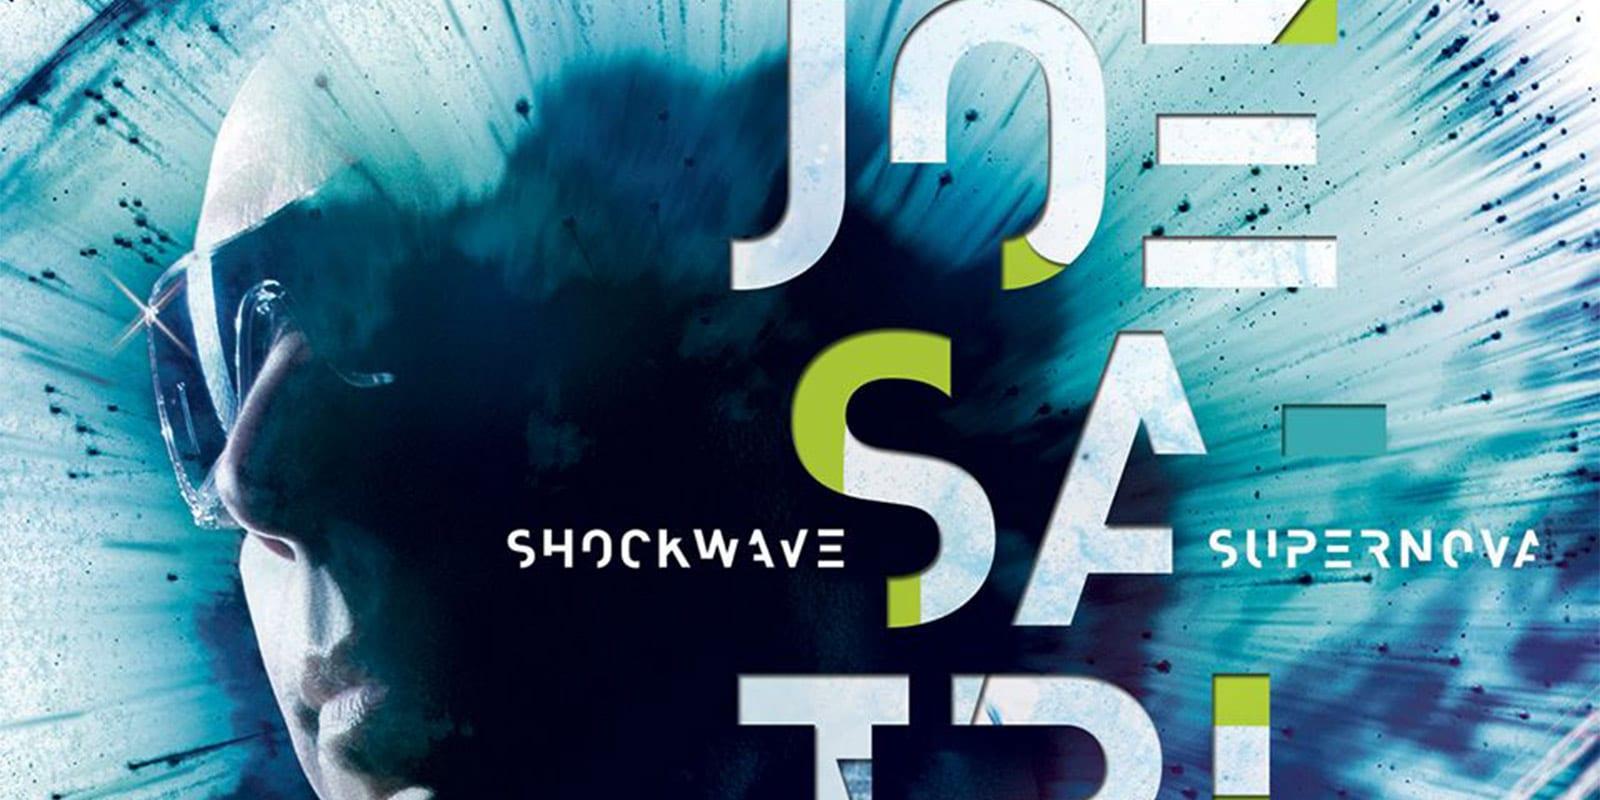 joe satriani shockwave supernova album cover 2015